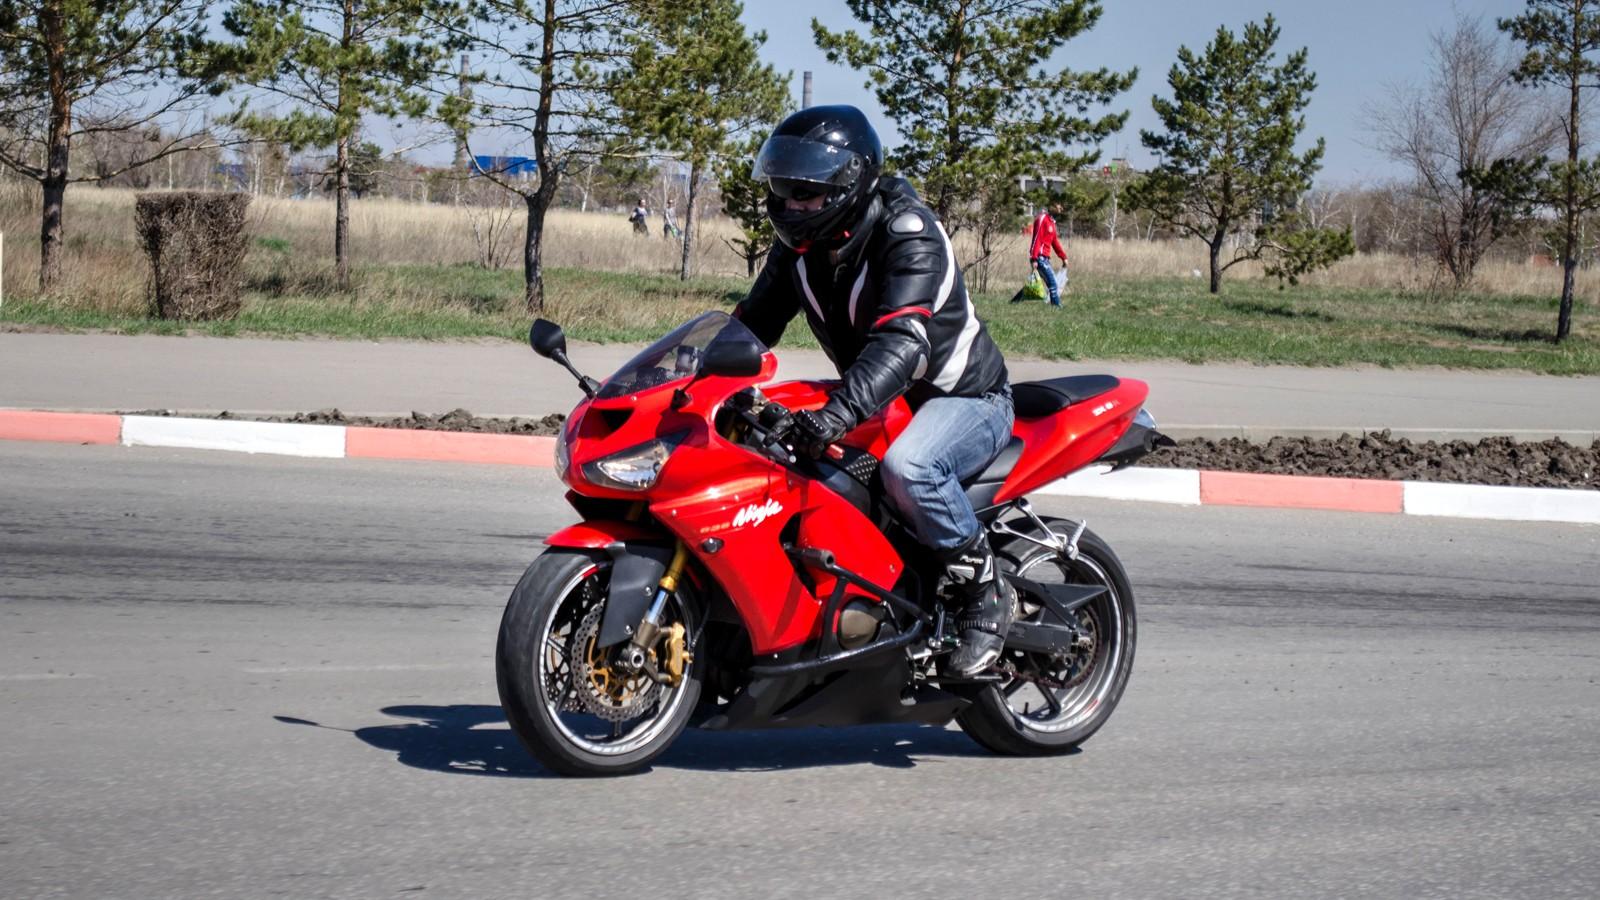 Opening of the motorcycle season